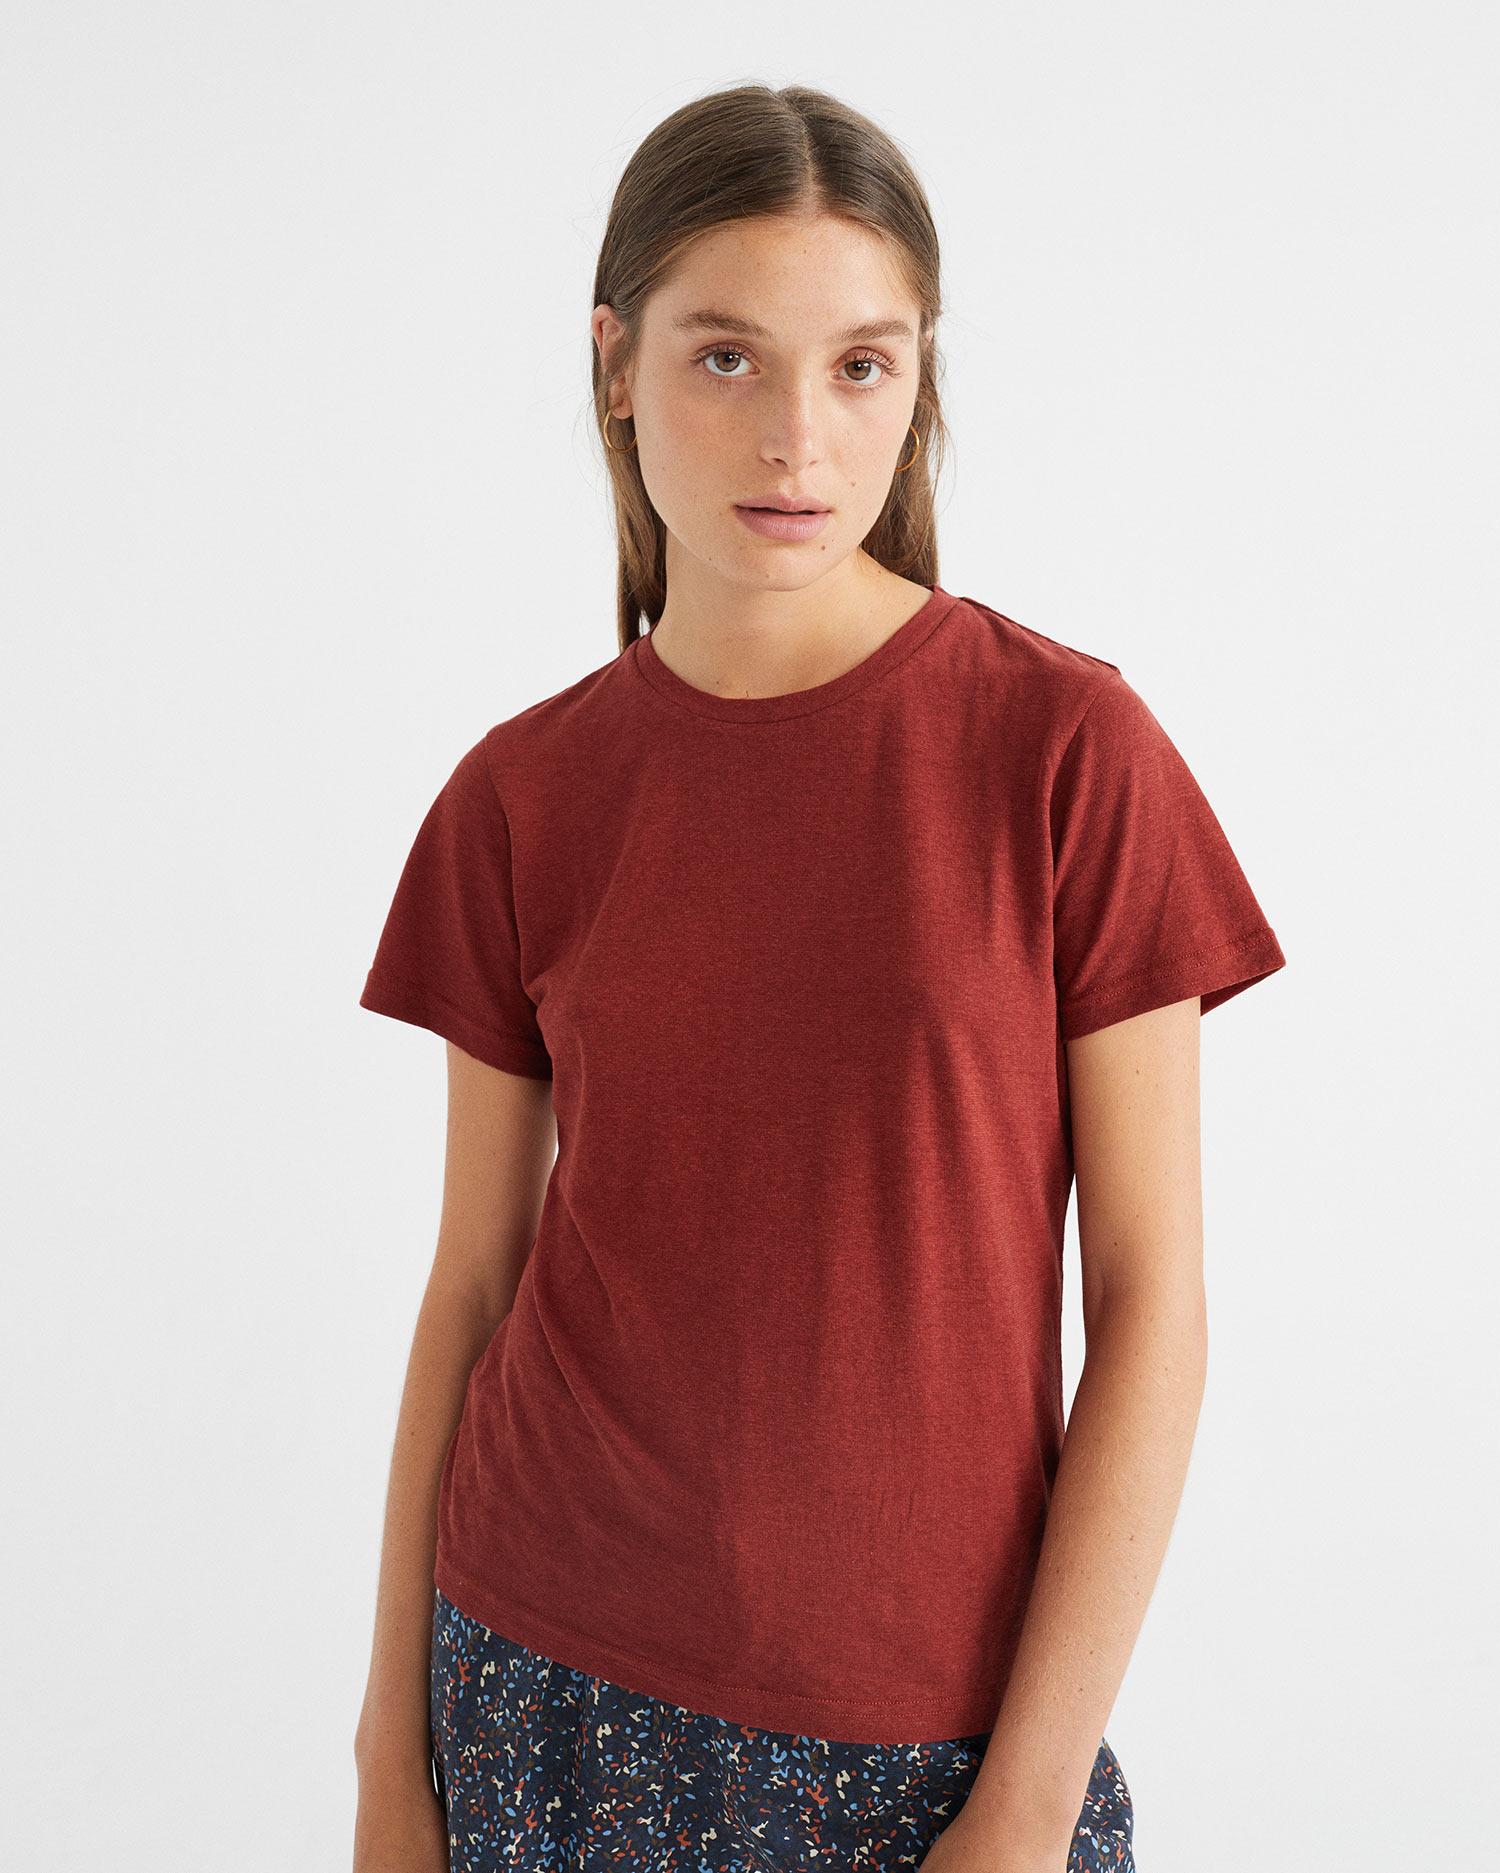 teja hemp juno t-shirt, damen - thinking mu